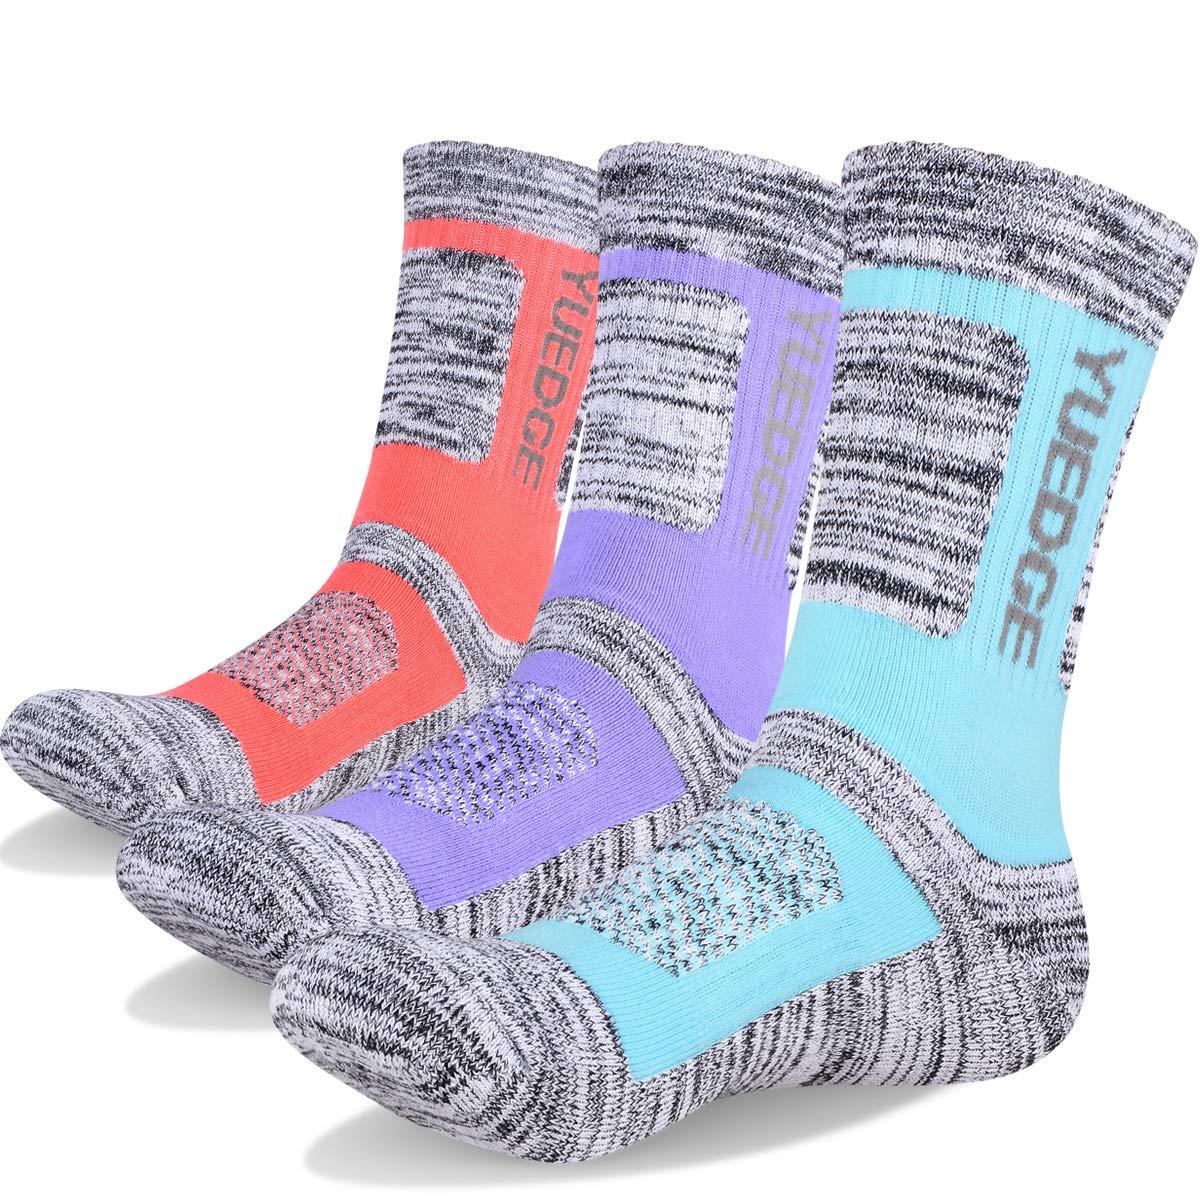 YUEDGE 3 Pairs Womens Walking Socks Cushion Breathable Trekking Socks Outdoor Winter Thermal Warm Socks